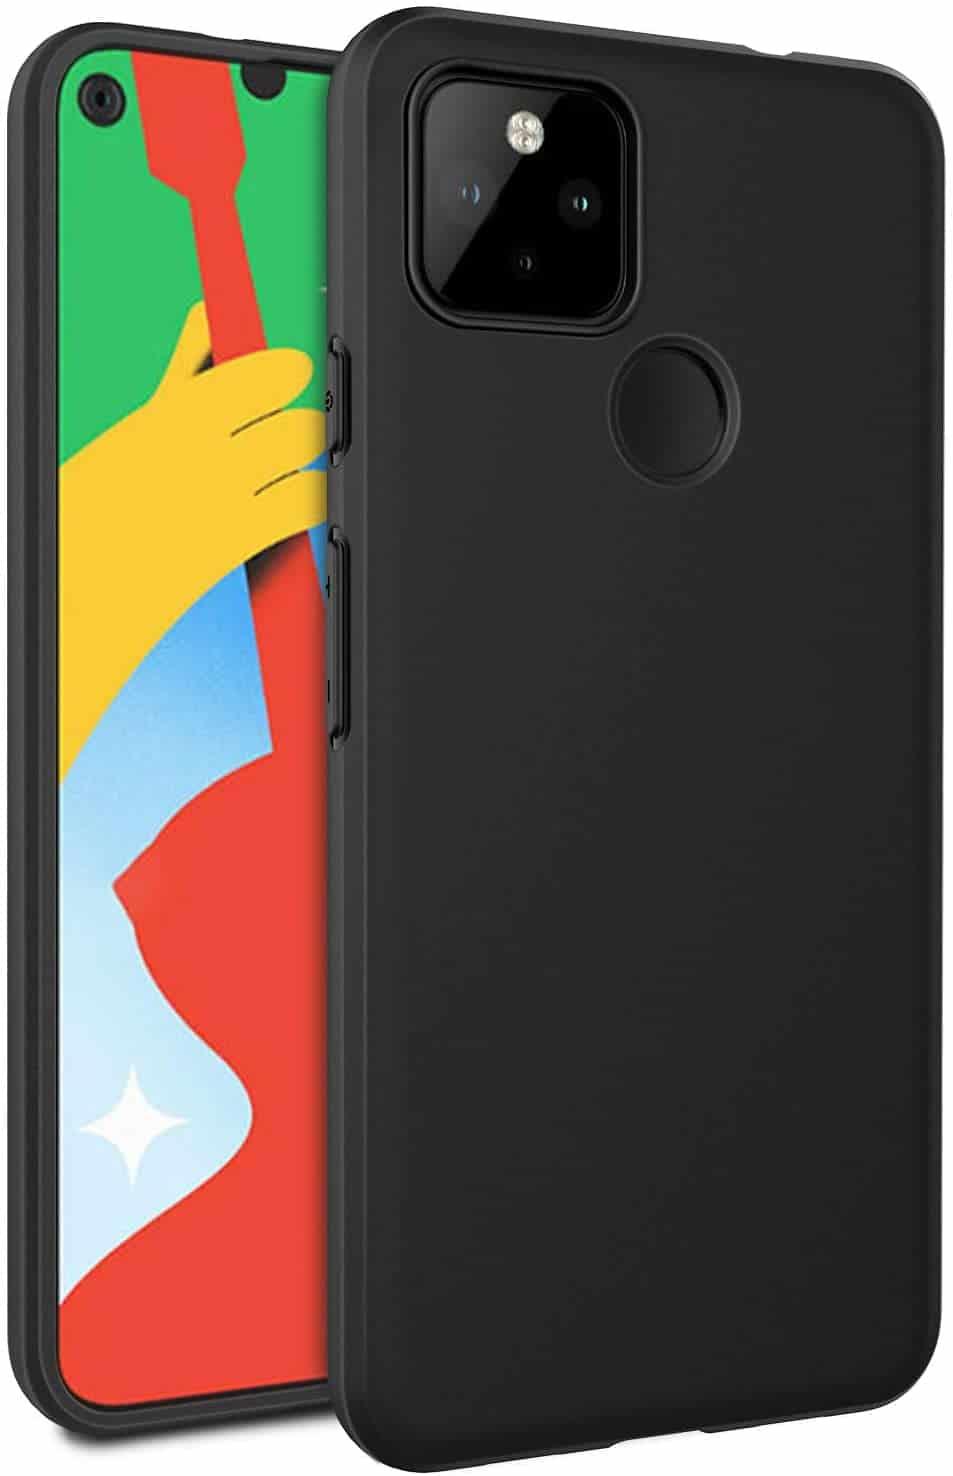 pixel 5 cases